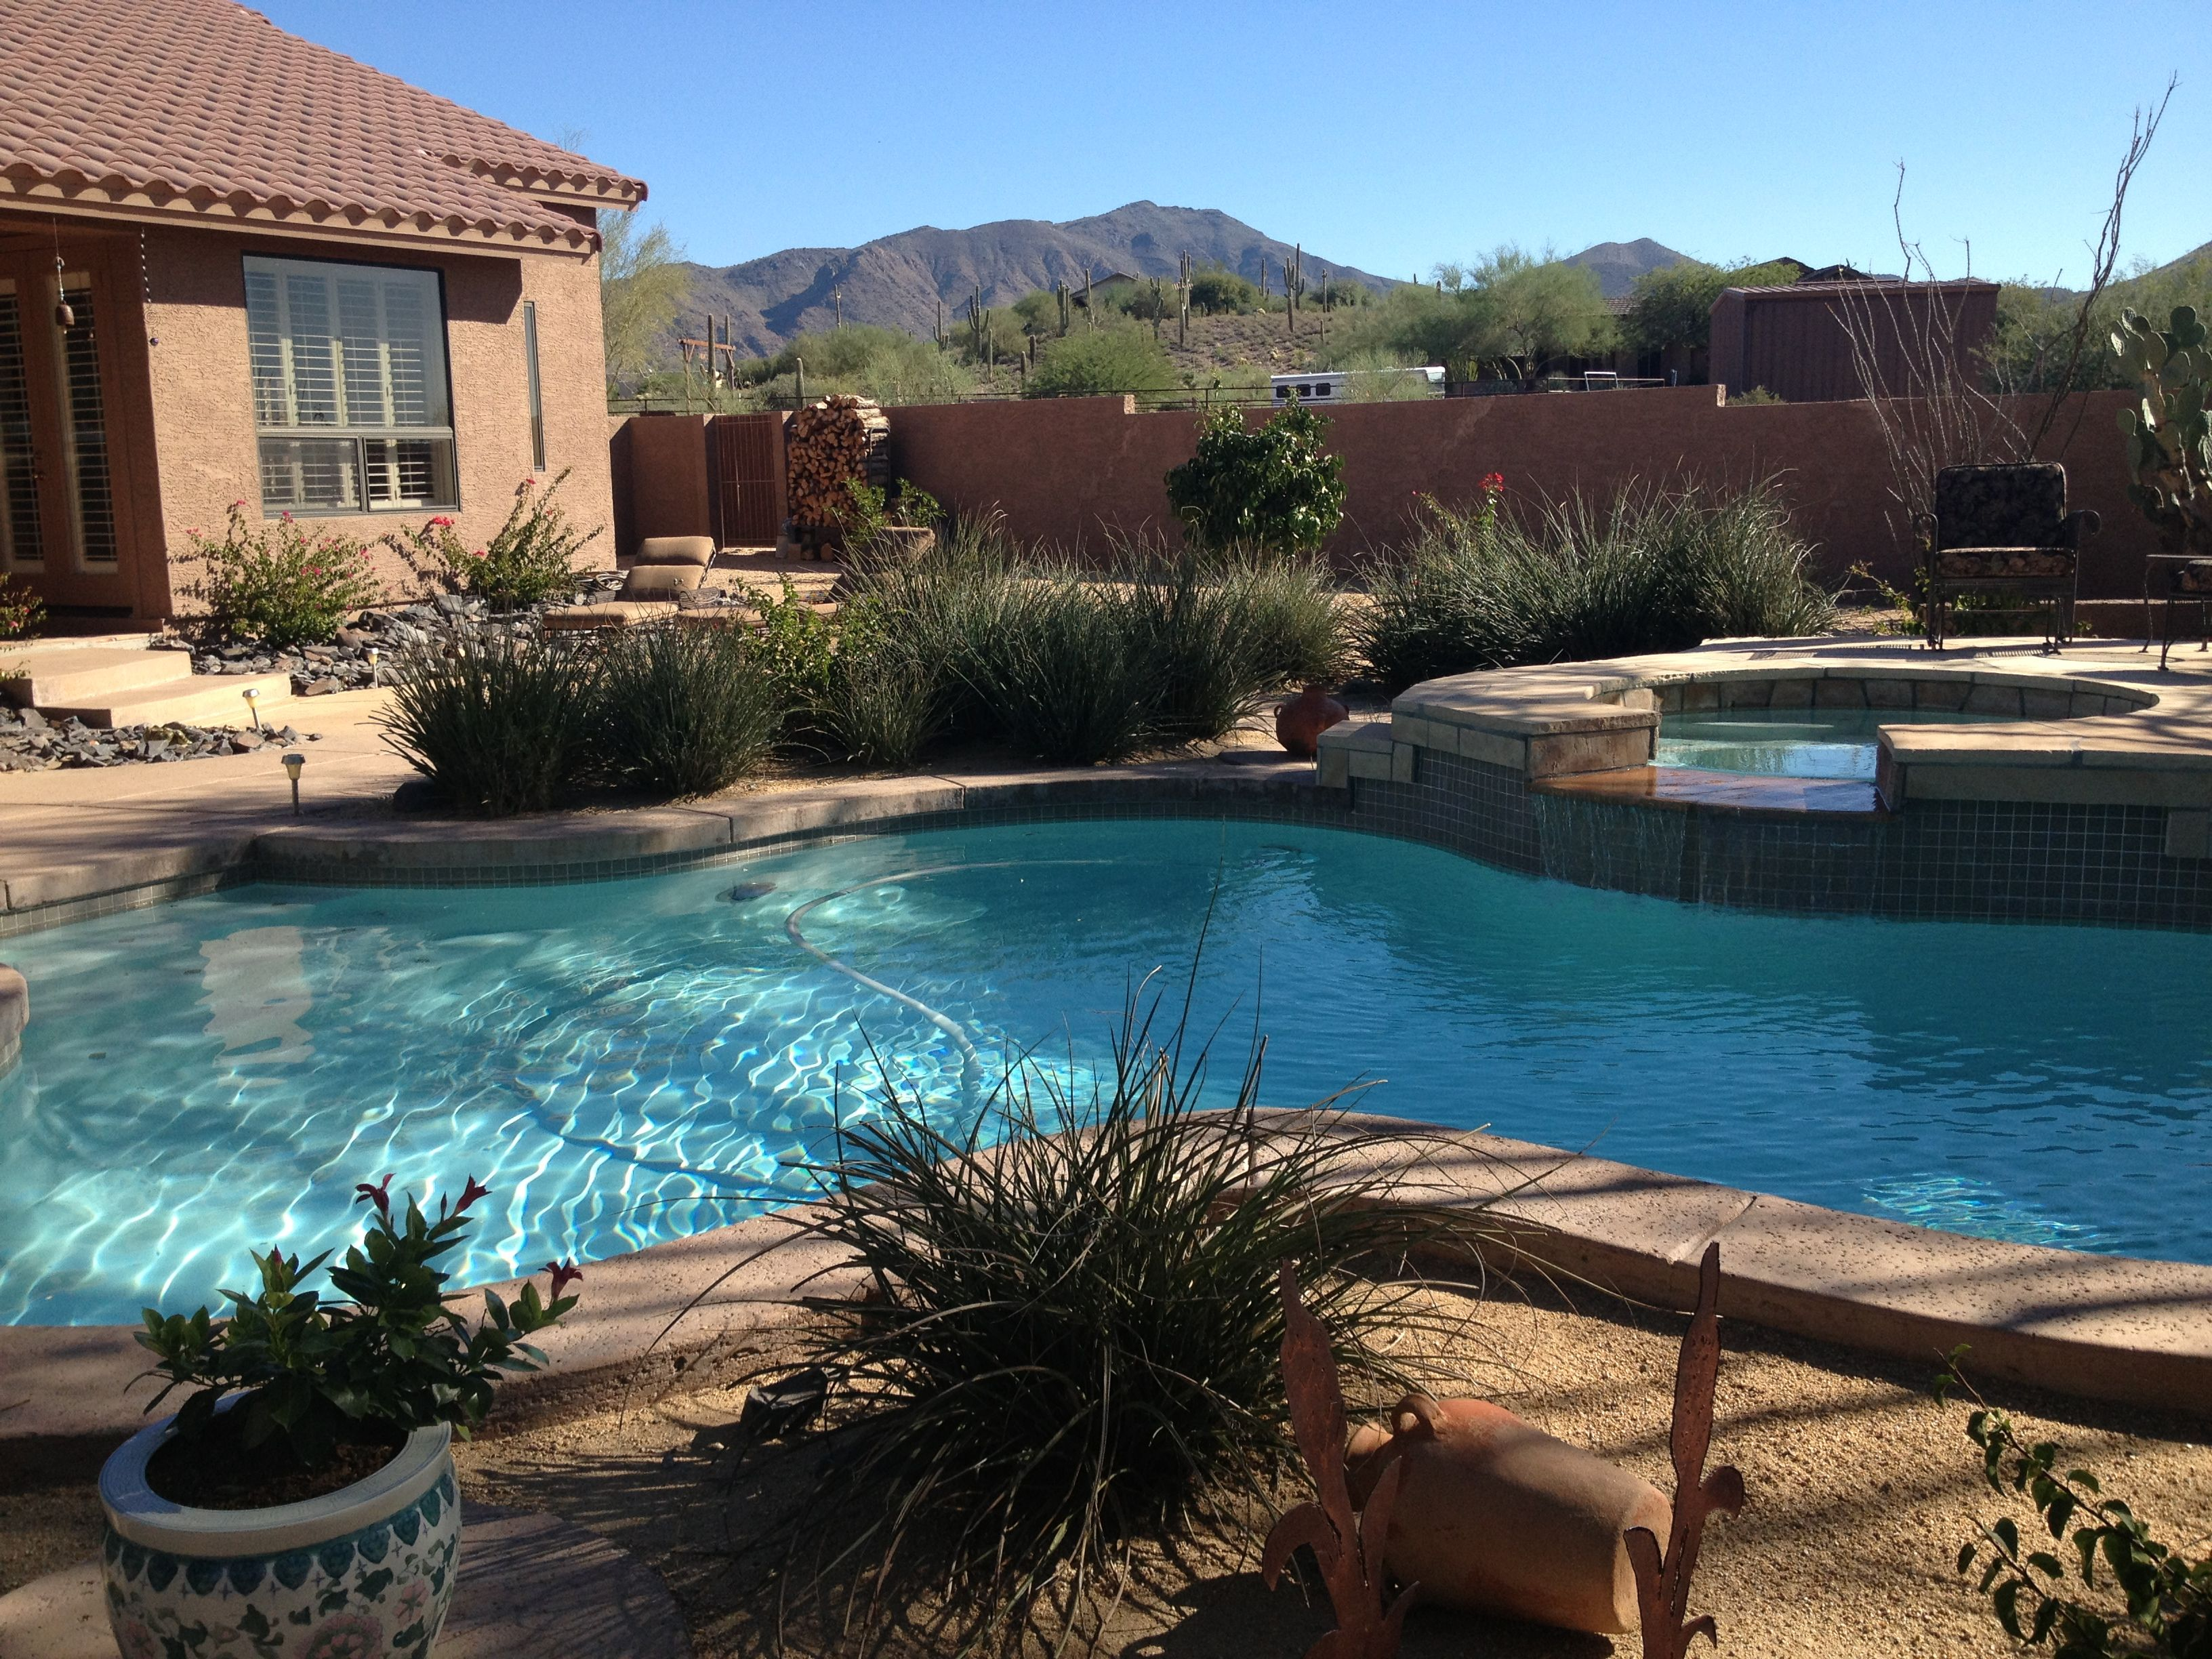 Arizona backyard pool home stuff pinterest for Garden pool in arizona